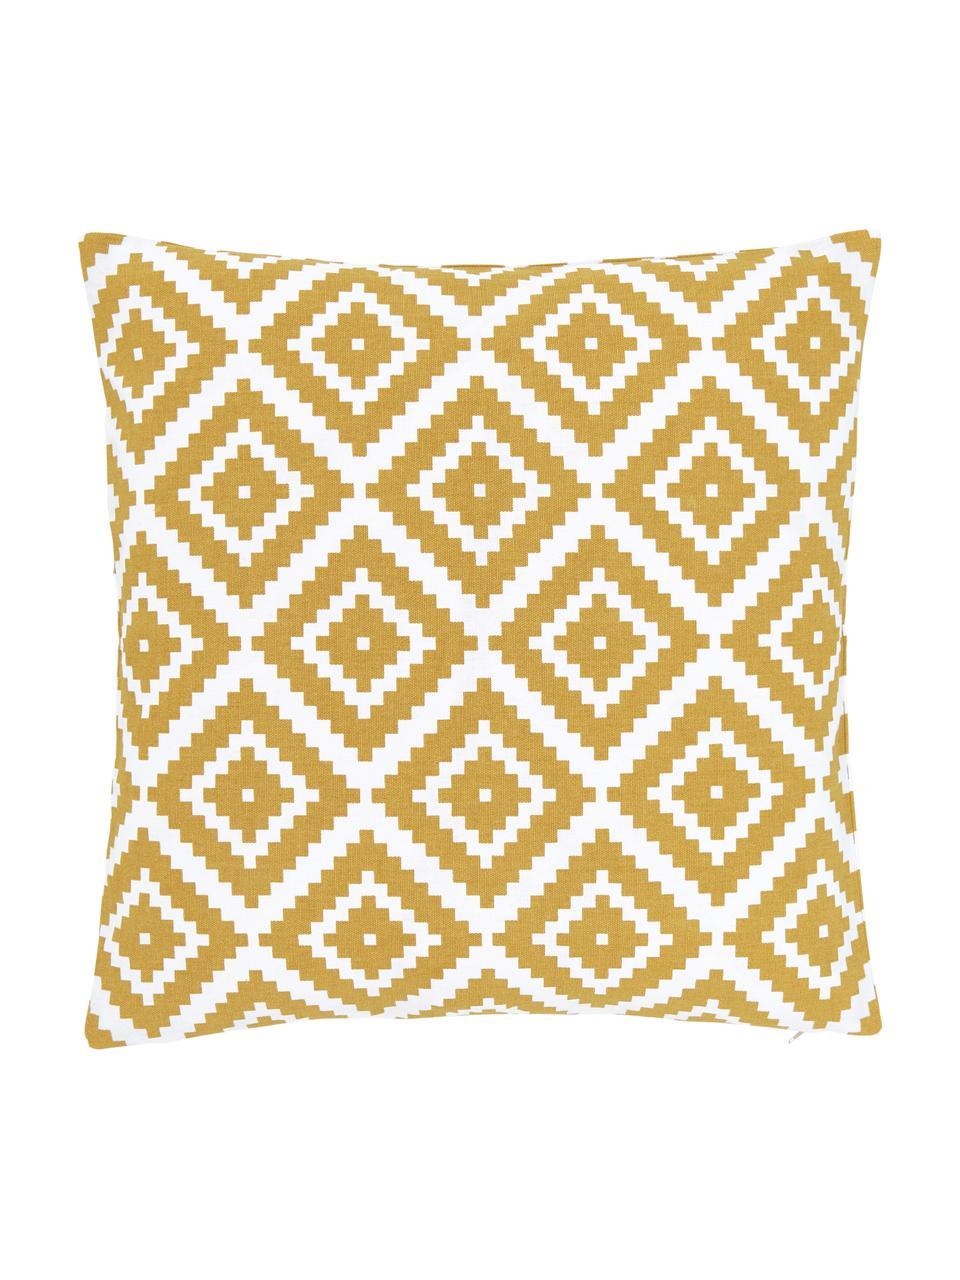 Federa arredo giallo/bianco Miami, 100% cotone, Giallo, Larg. 45 x Lung. 45 cm